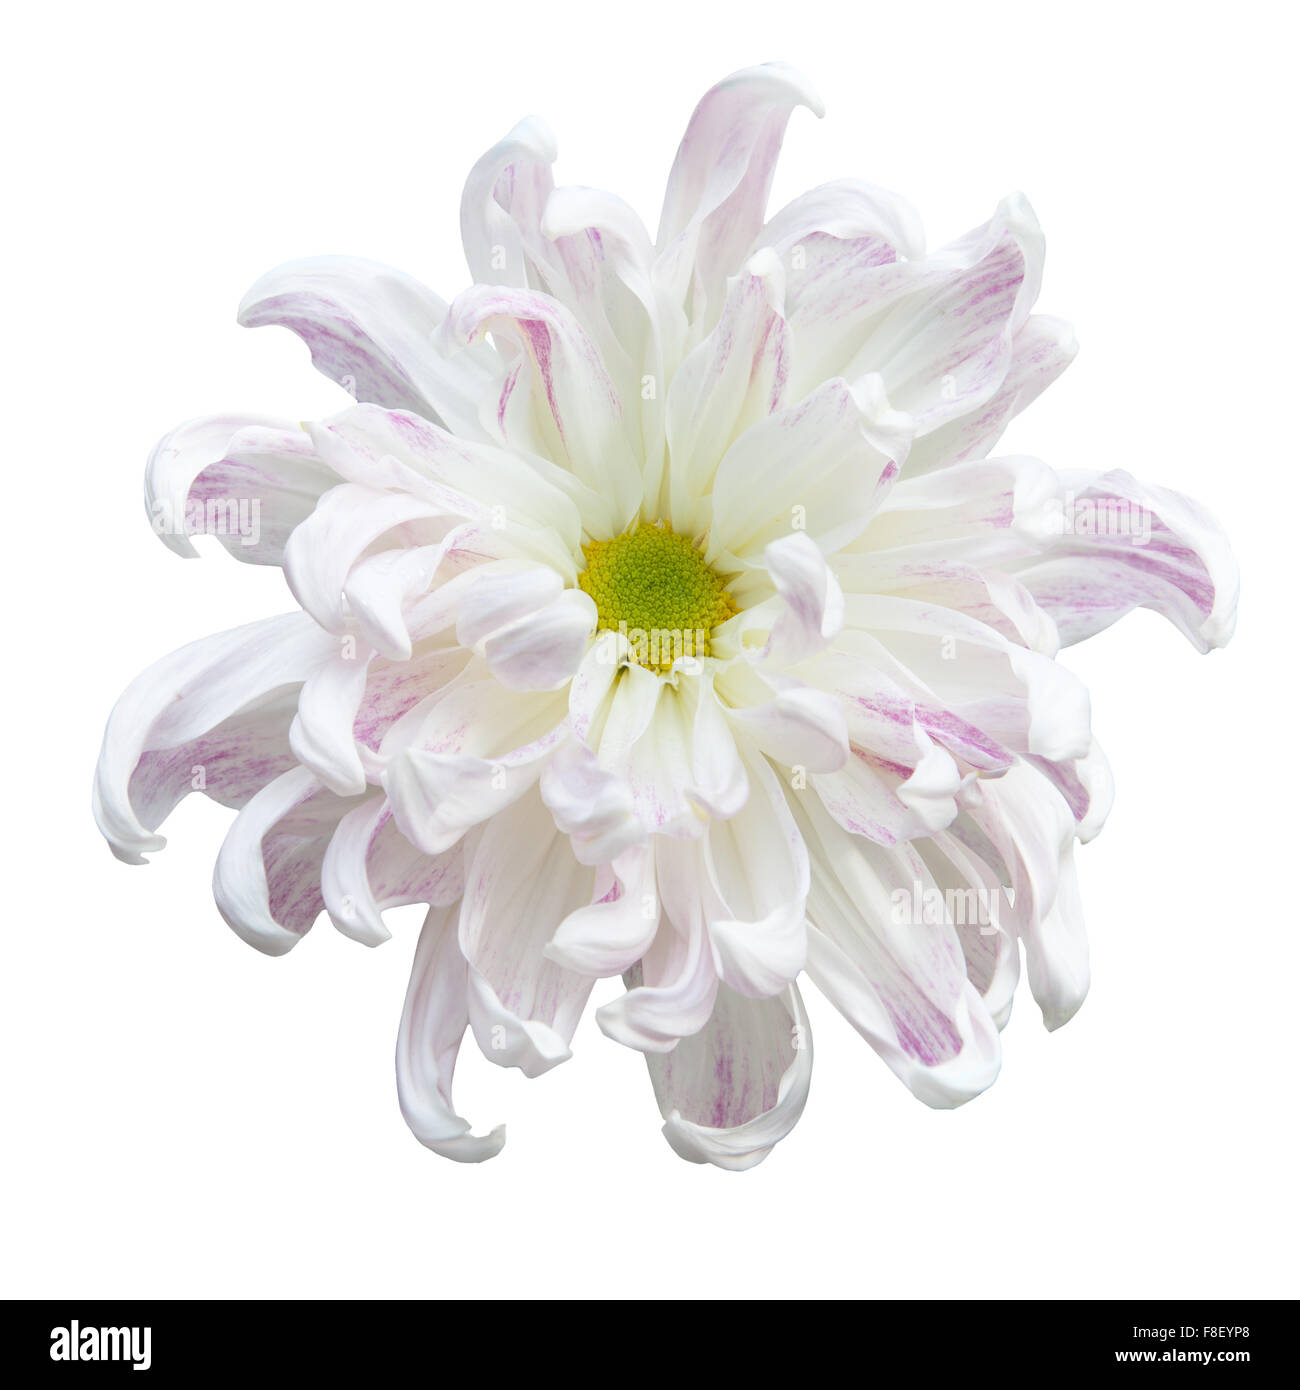 Daisy flower meaning stock photos daisy flower meaning stock beautiful white autumn irregular incurve chrysanthemummeaning big chrysanthemum isolated on white background izmirmasajfo